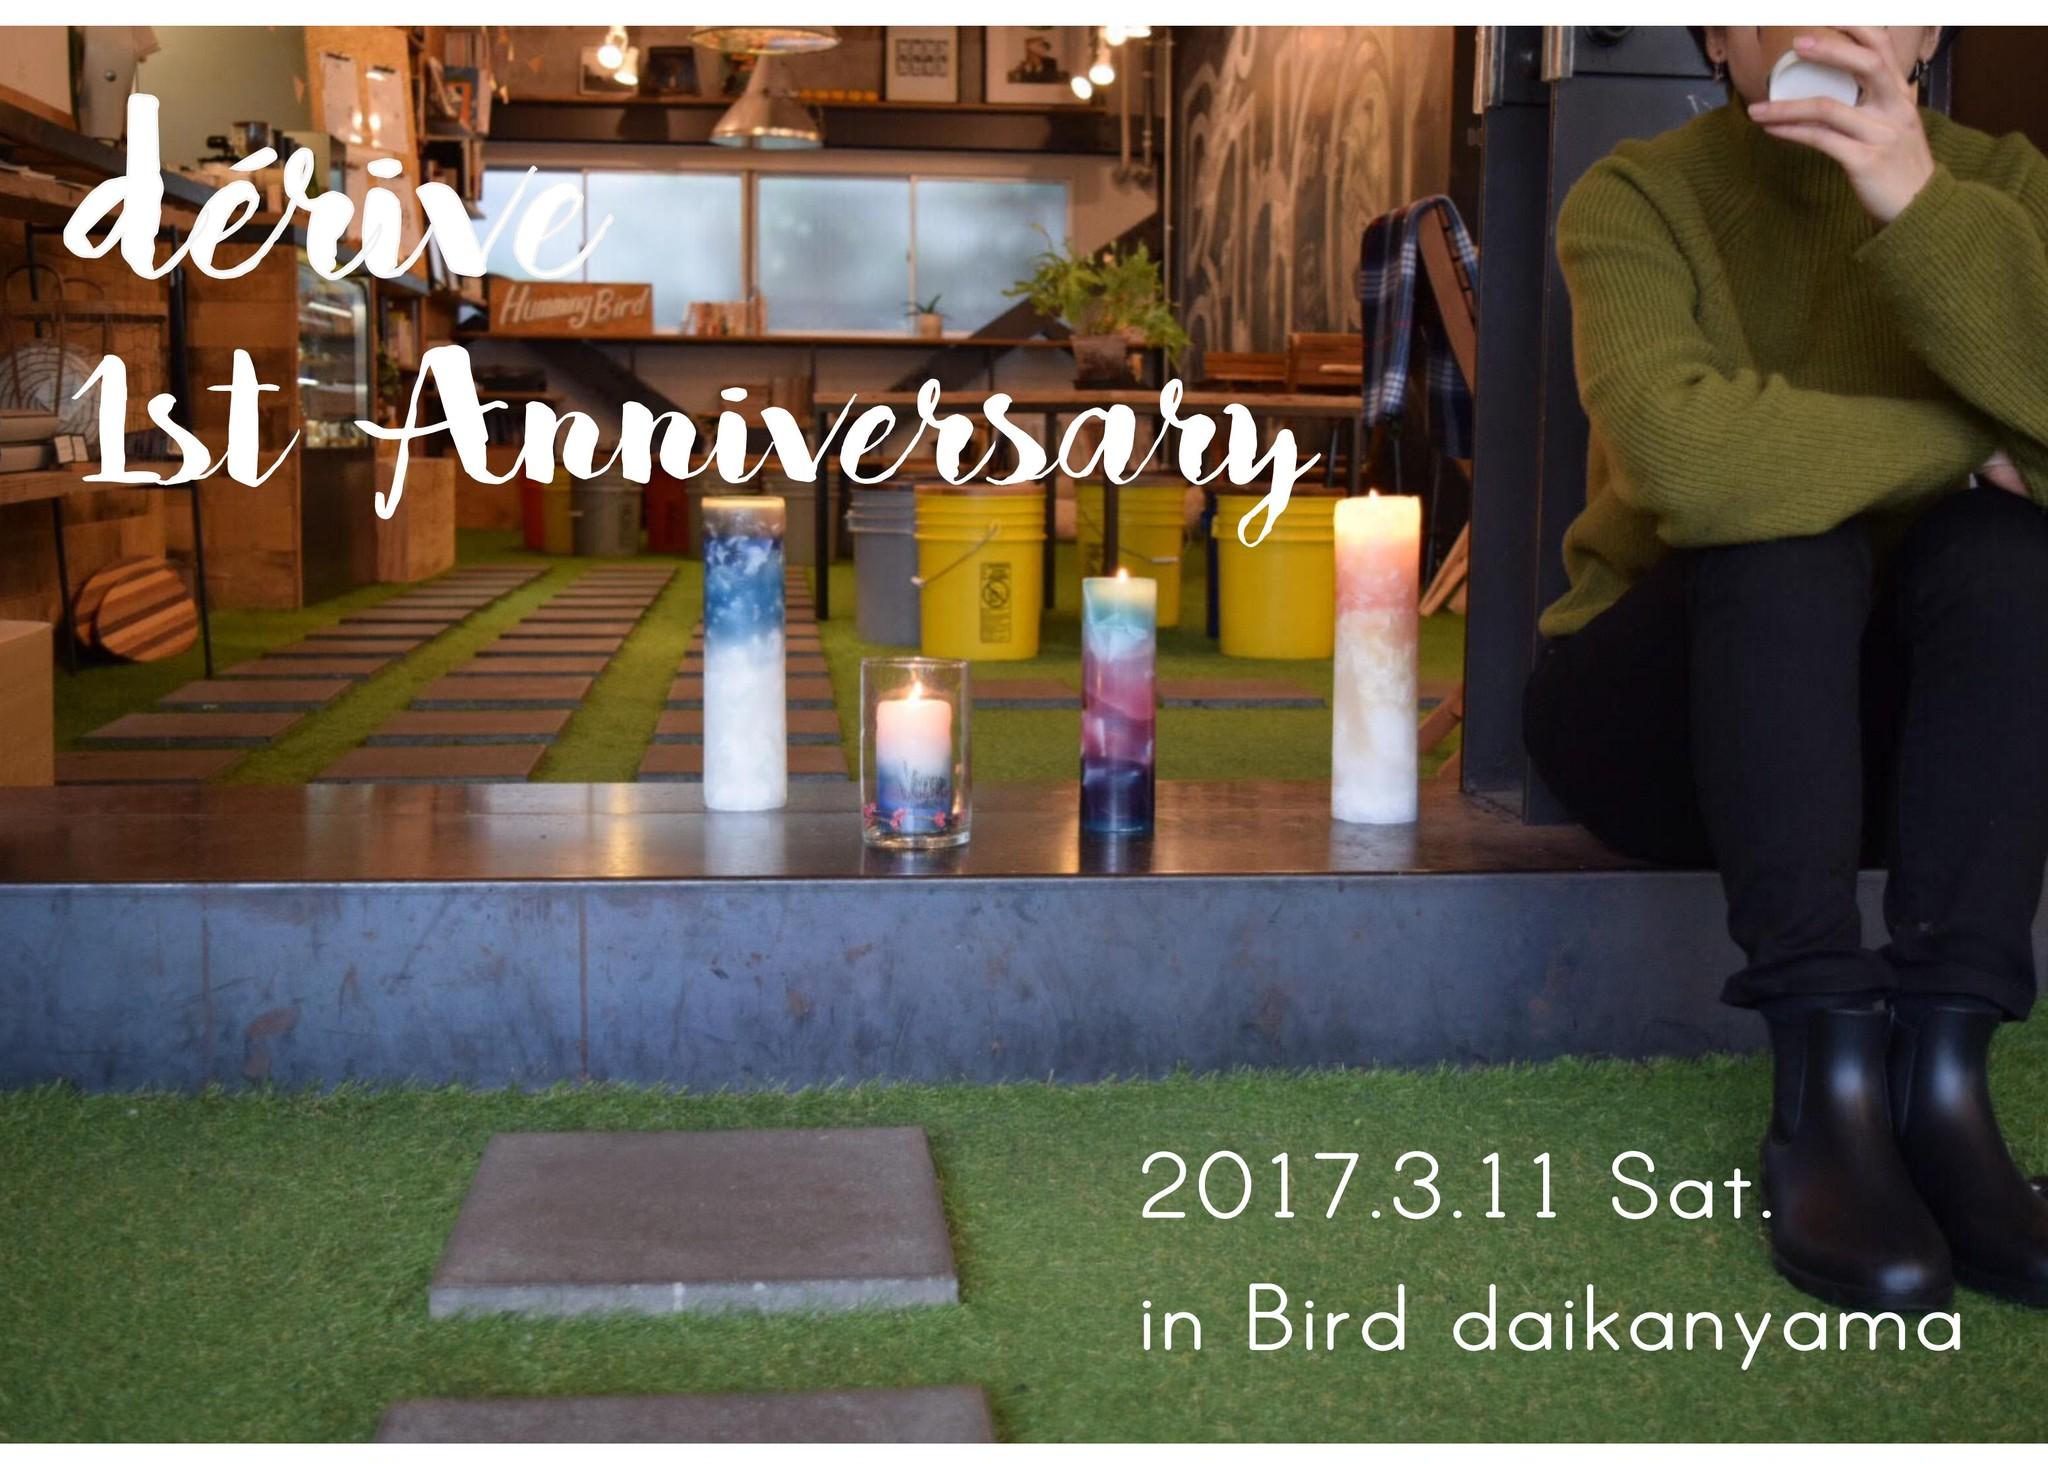 2017.3.11 dérive 1st anniversary